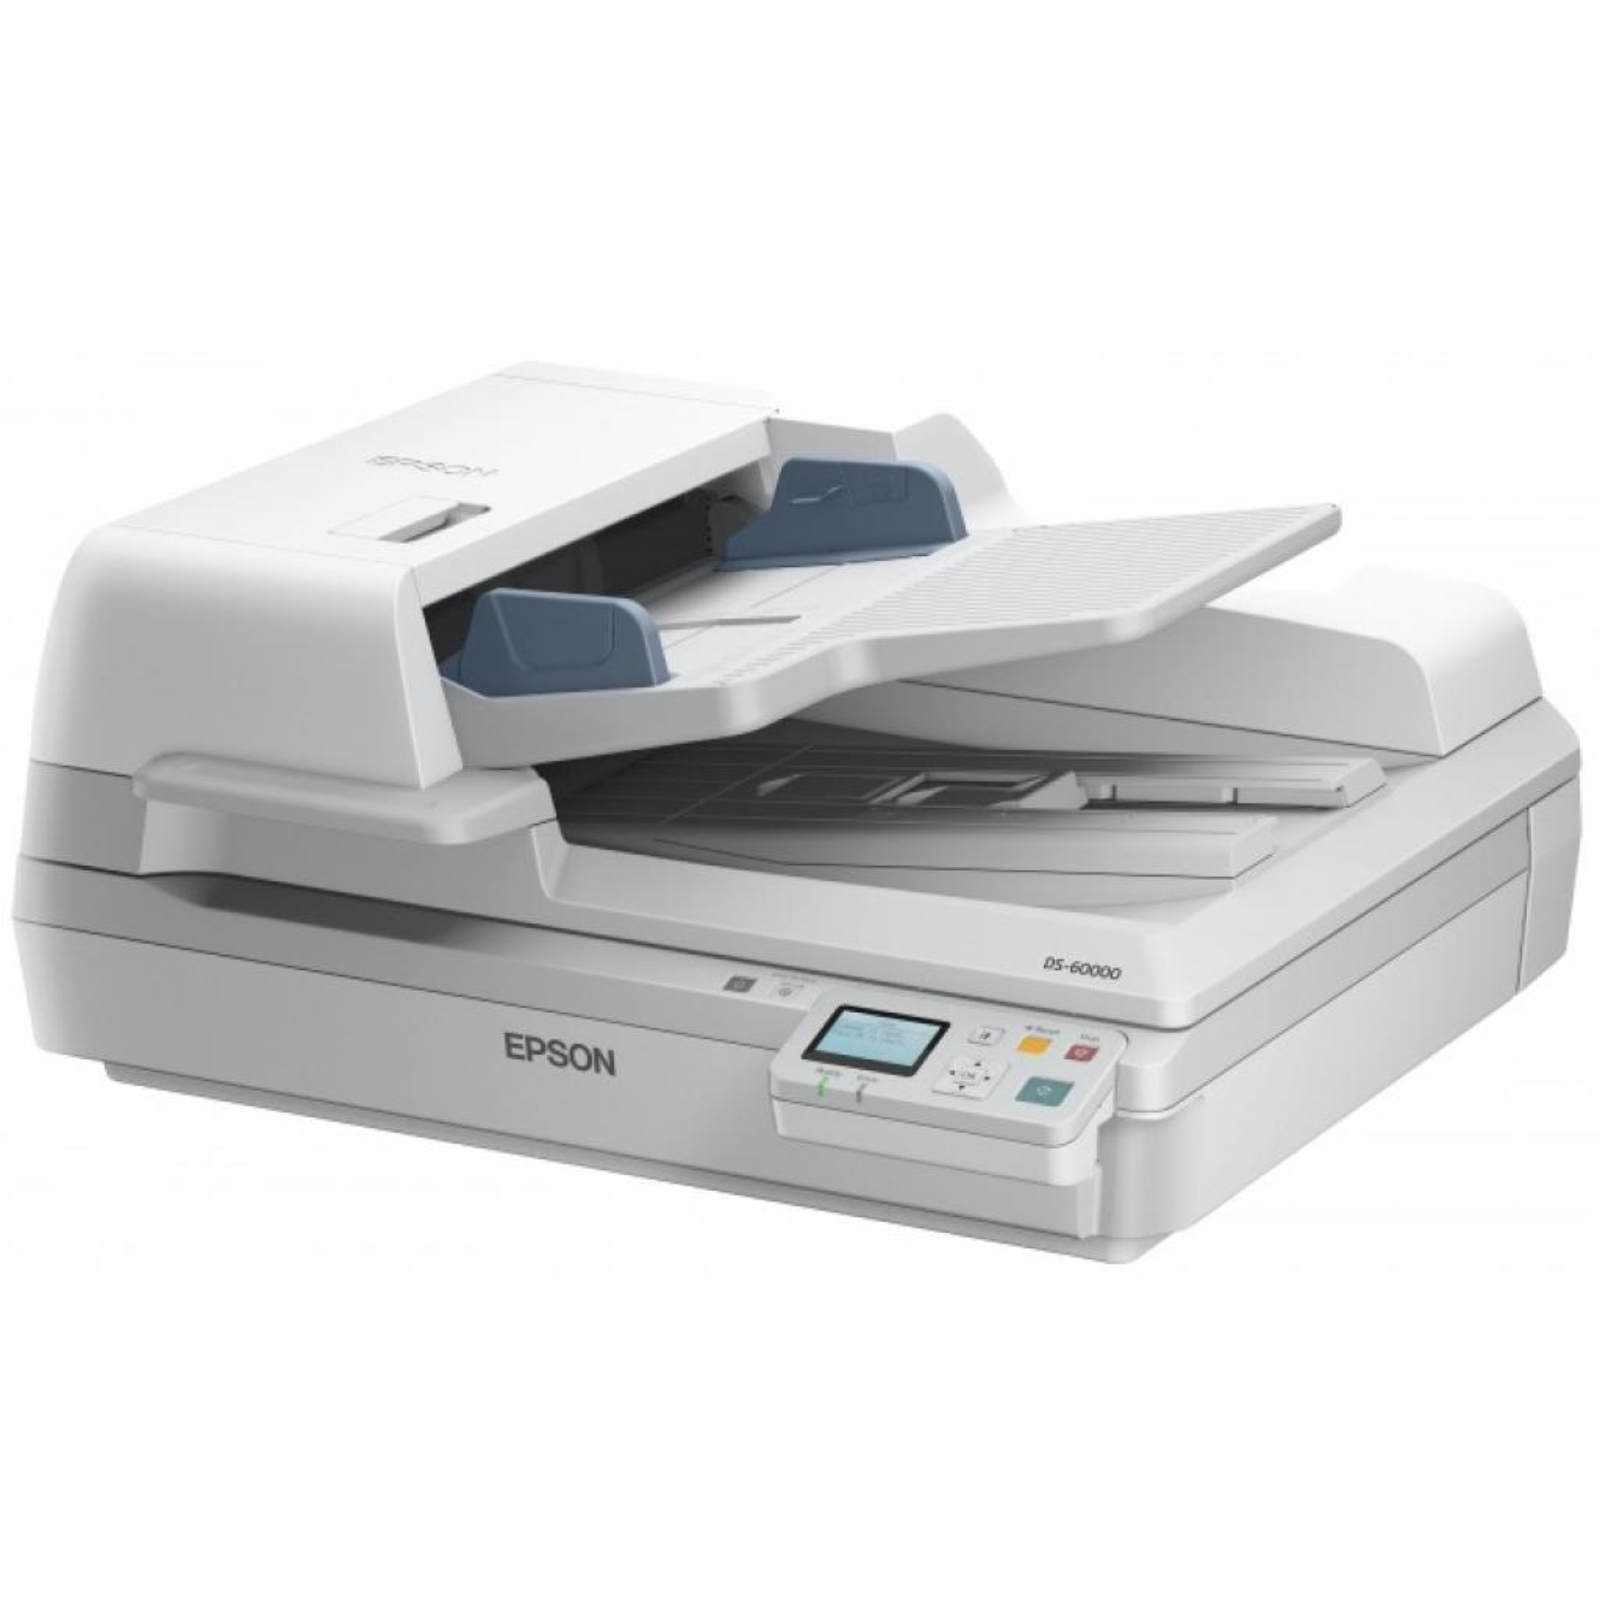 Сканер EPSON WorkForce DS-60000N (B11B204231BT) изображение 2